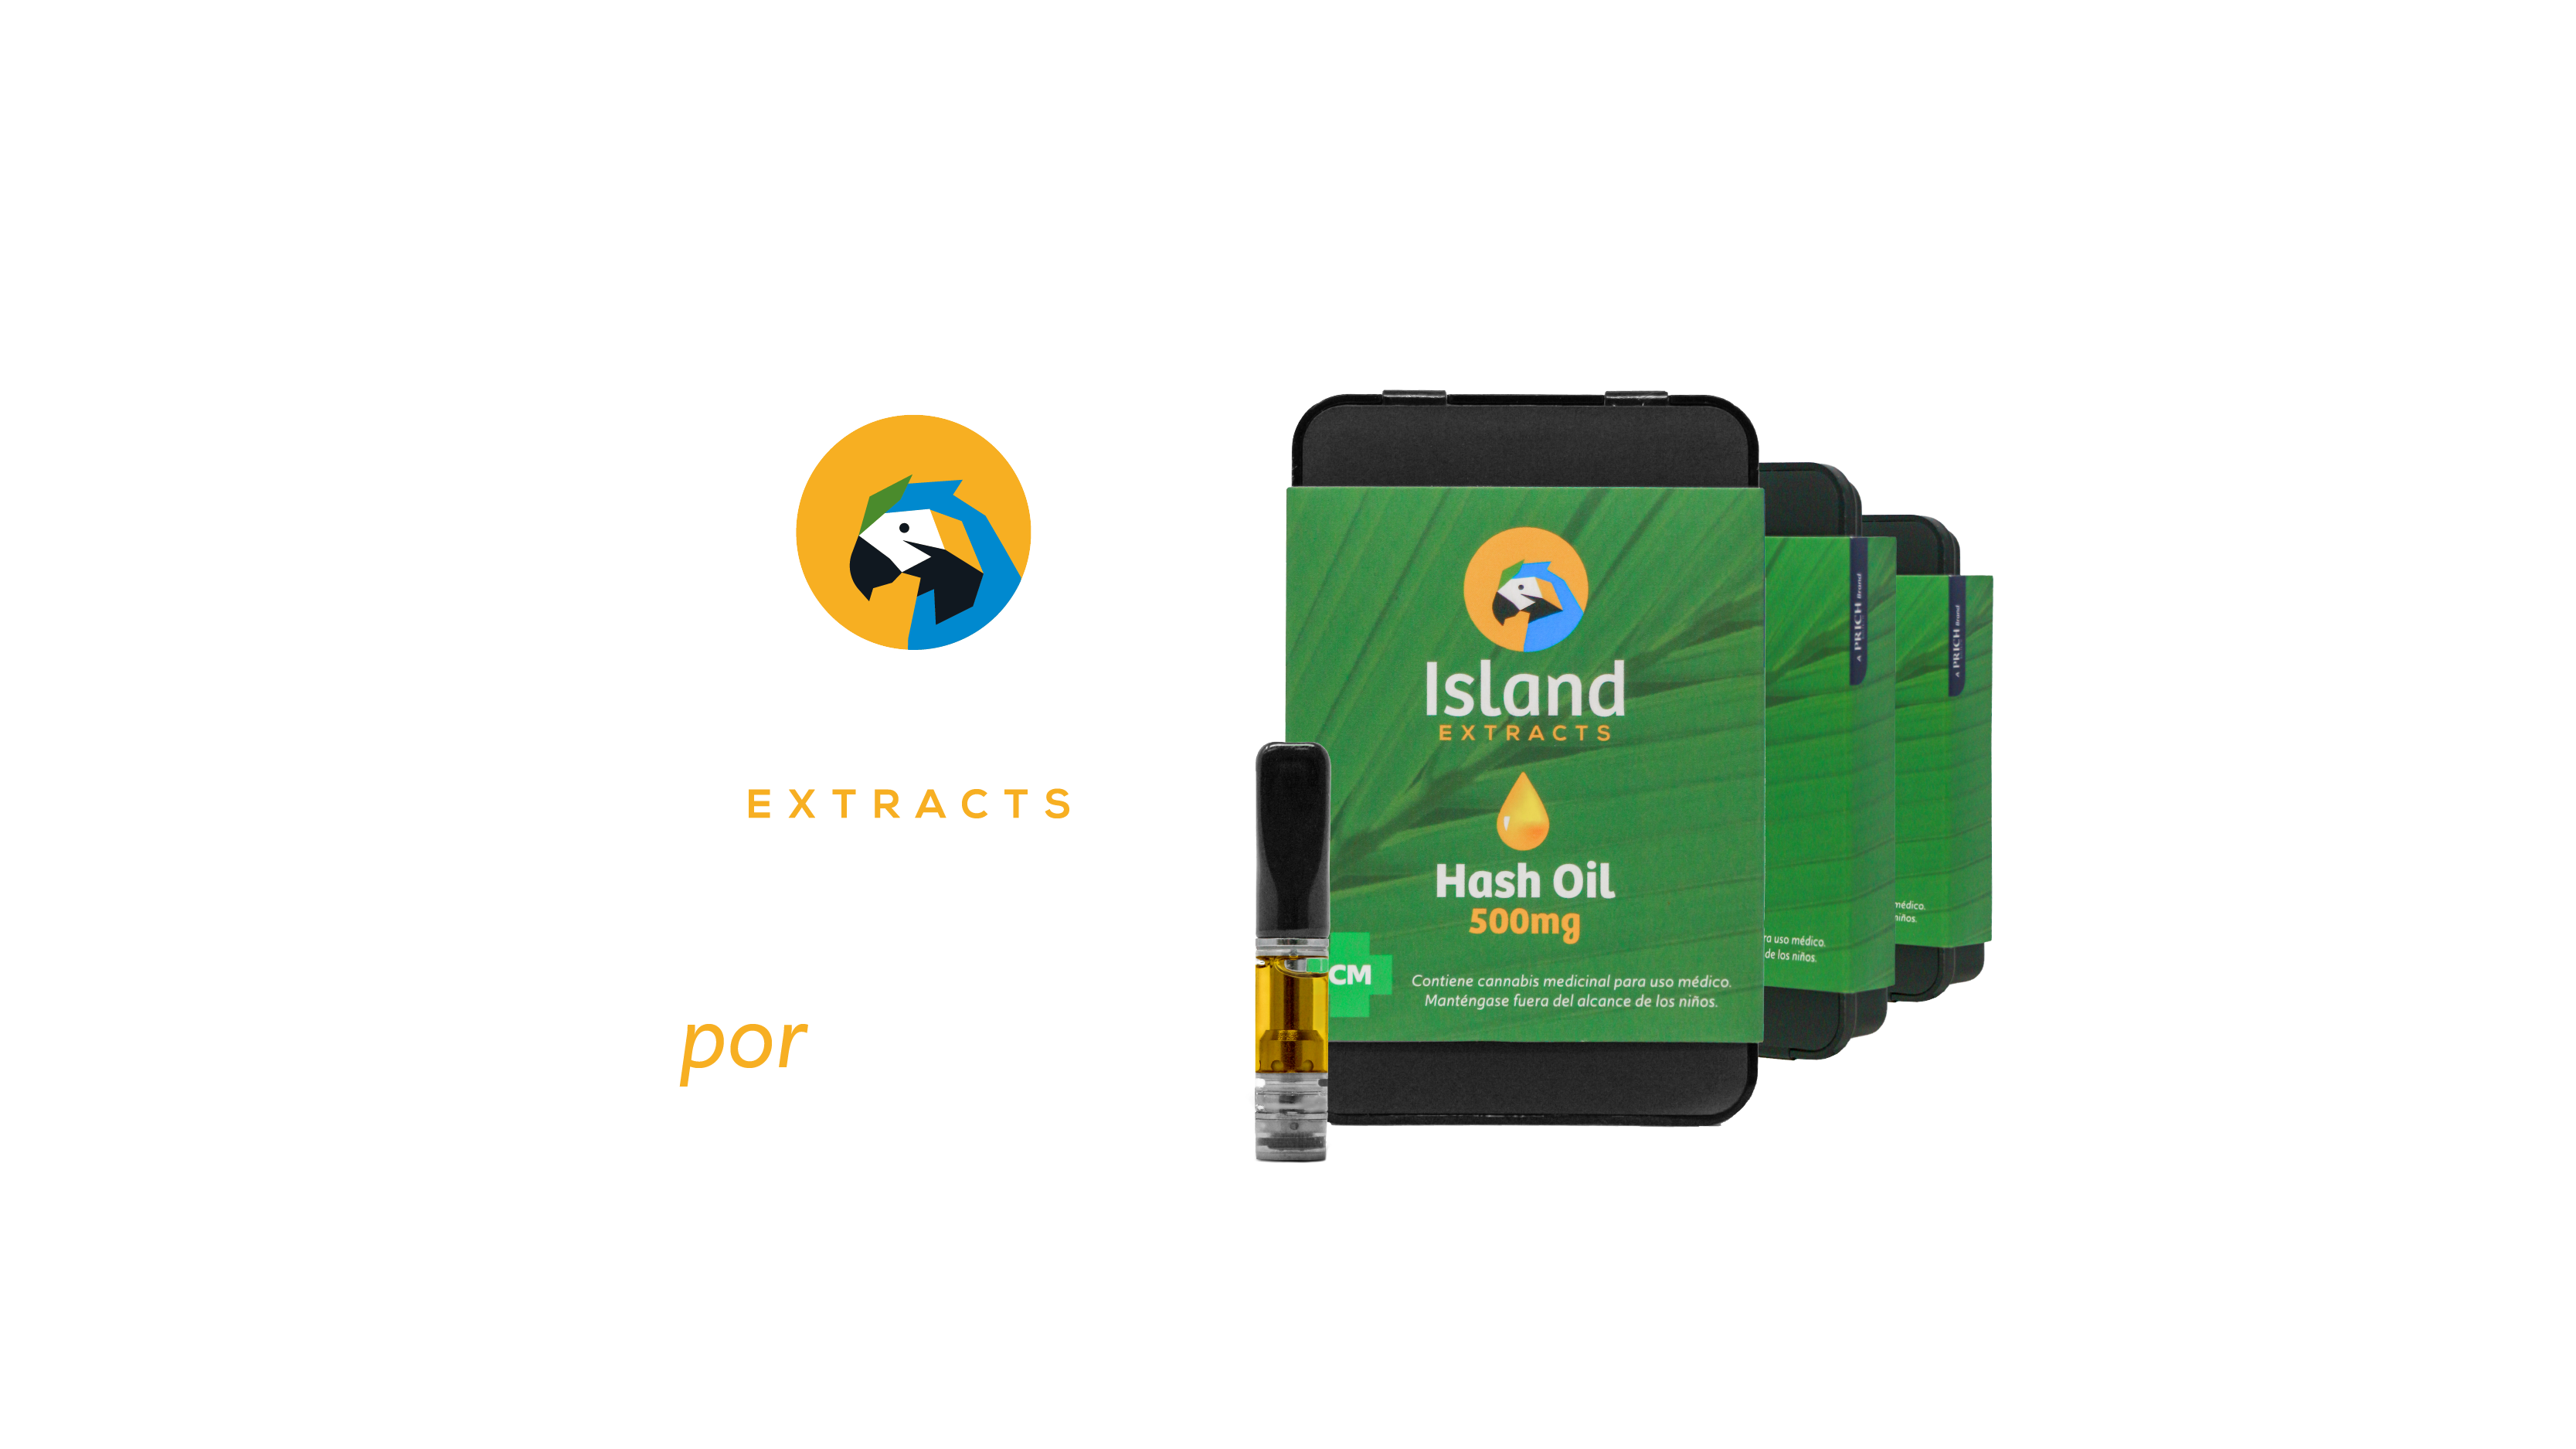 Web_3 Cartridge Island Extracts